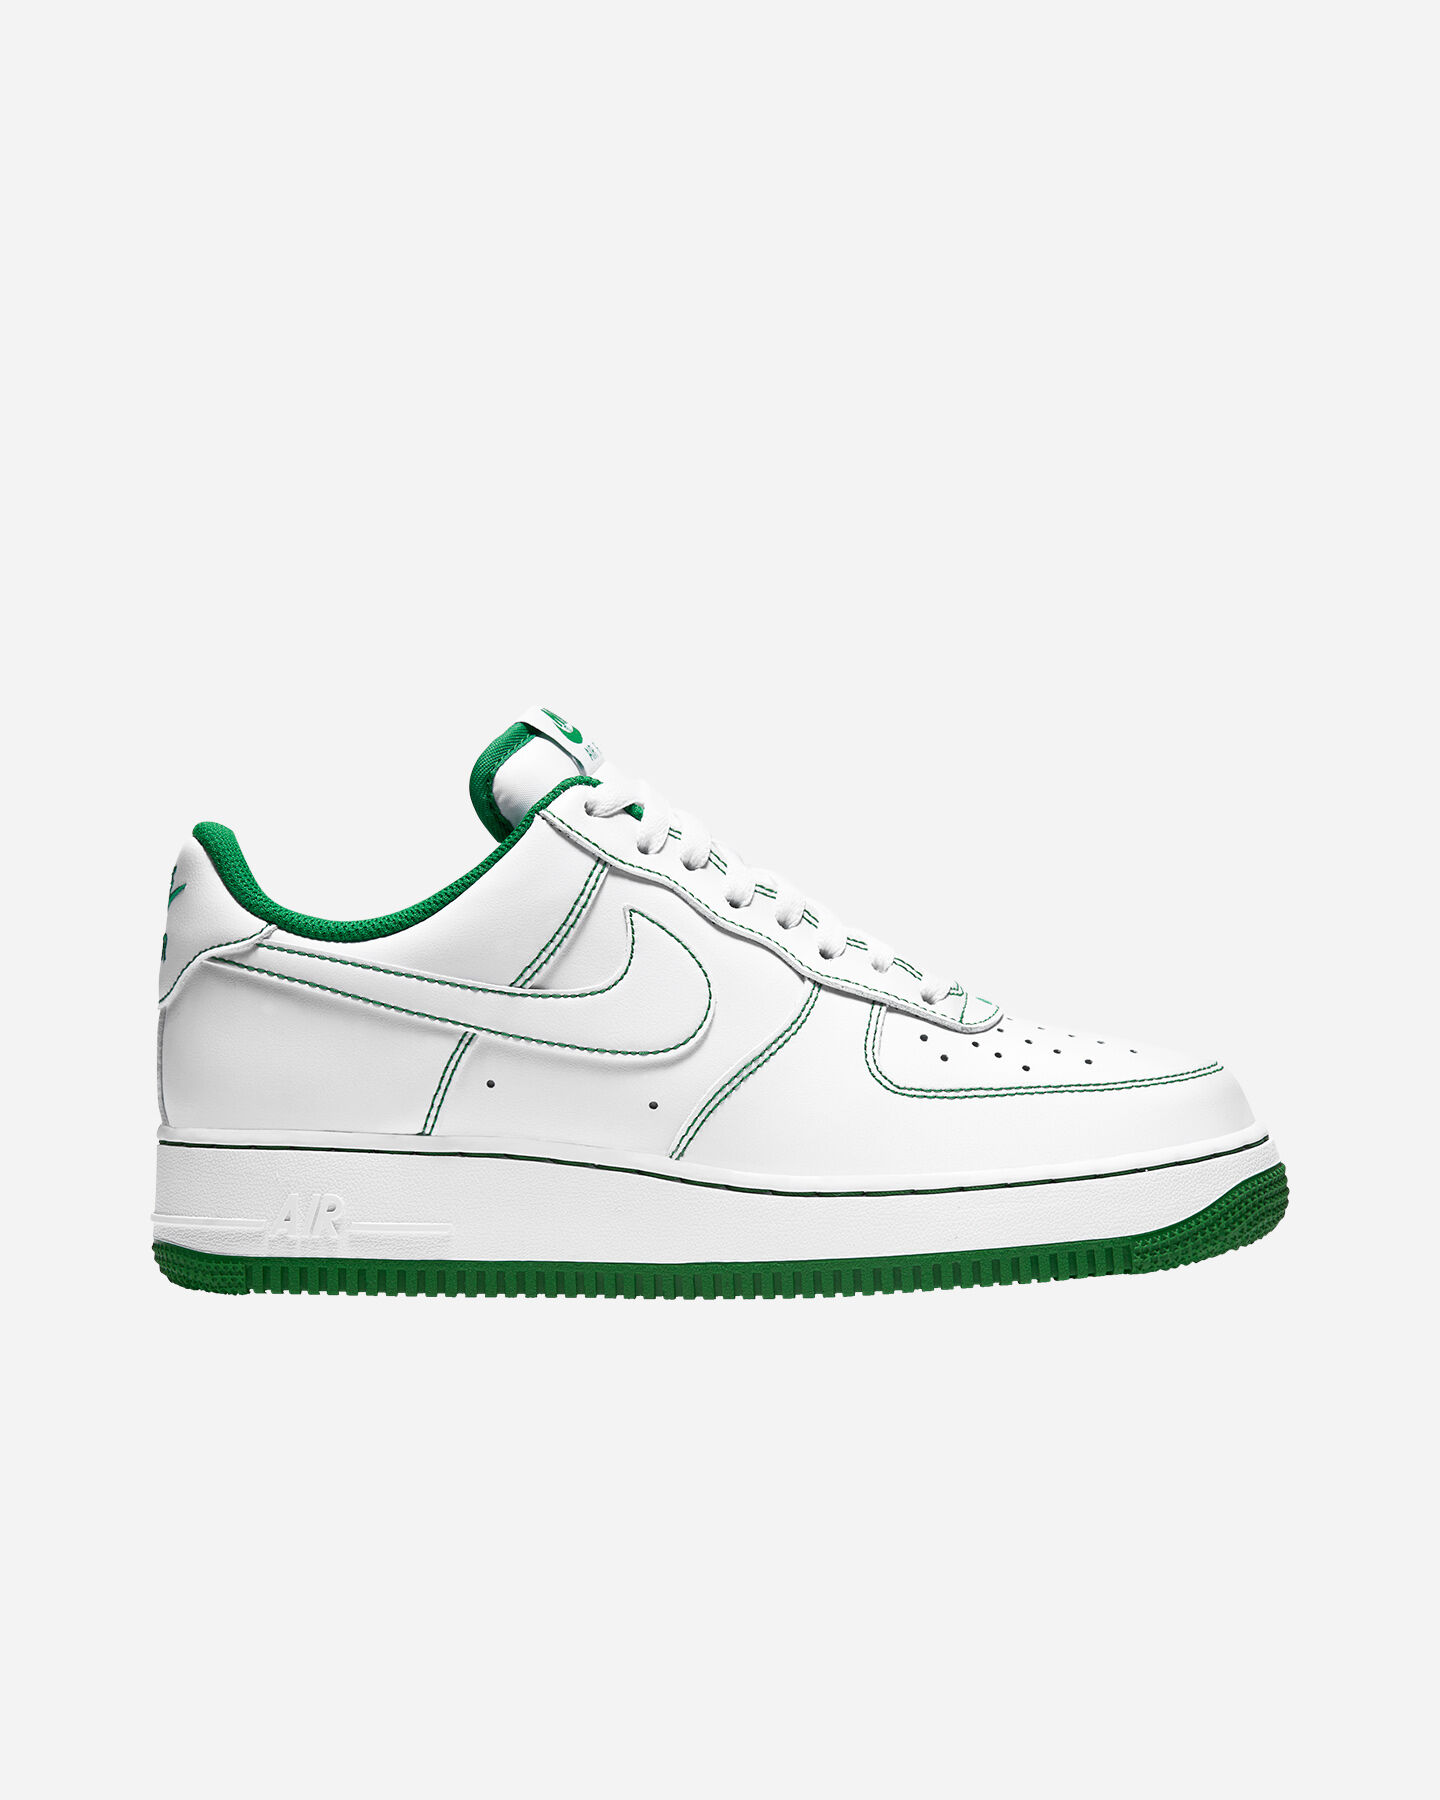 air force 1 uomo bianche e verdi